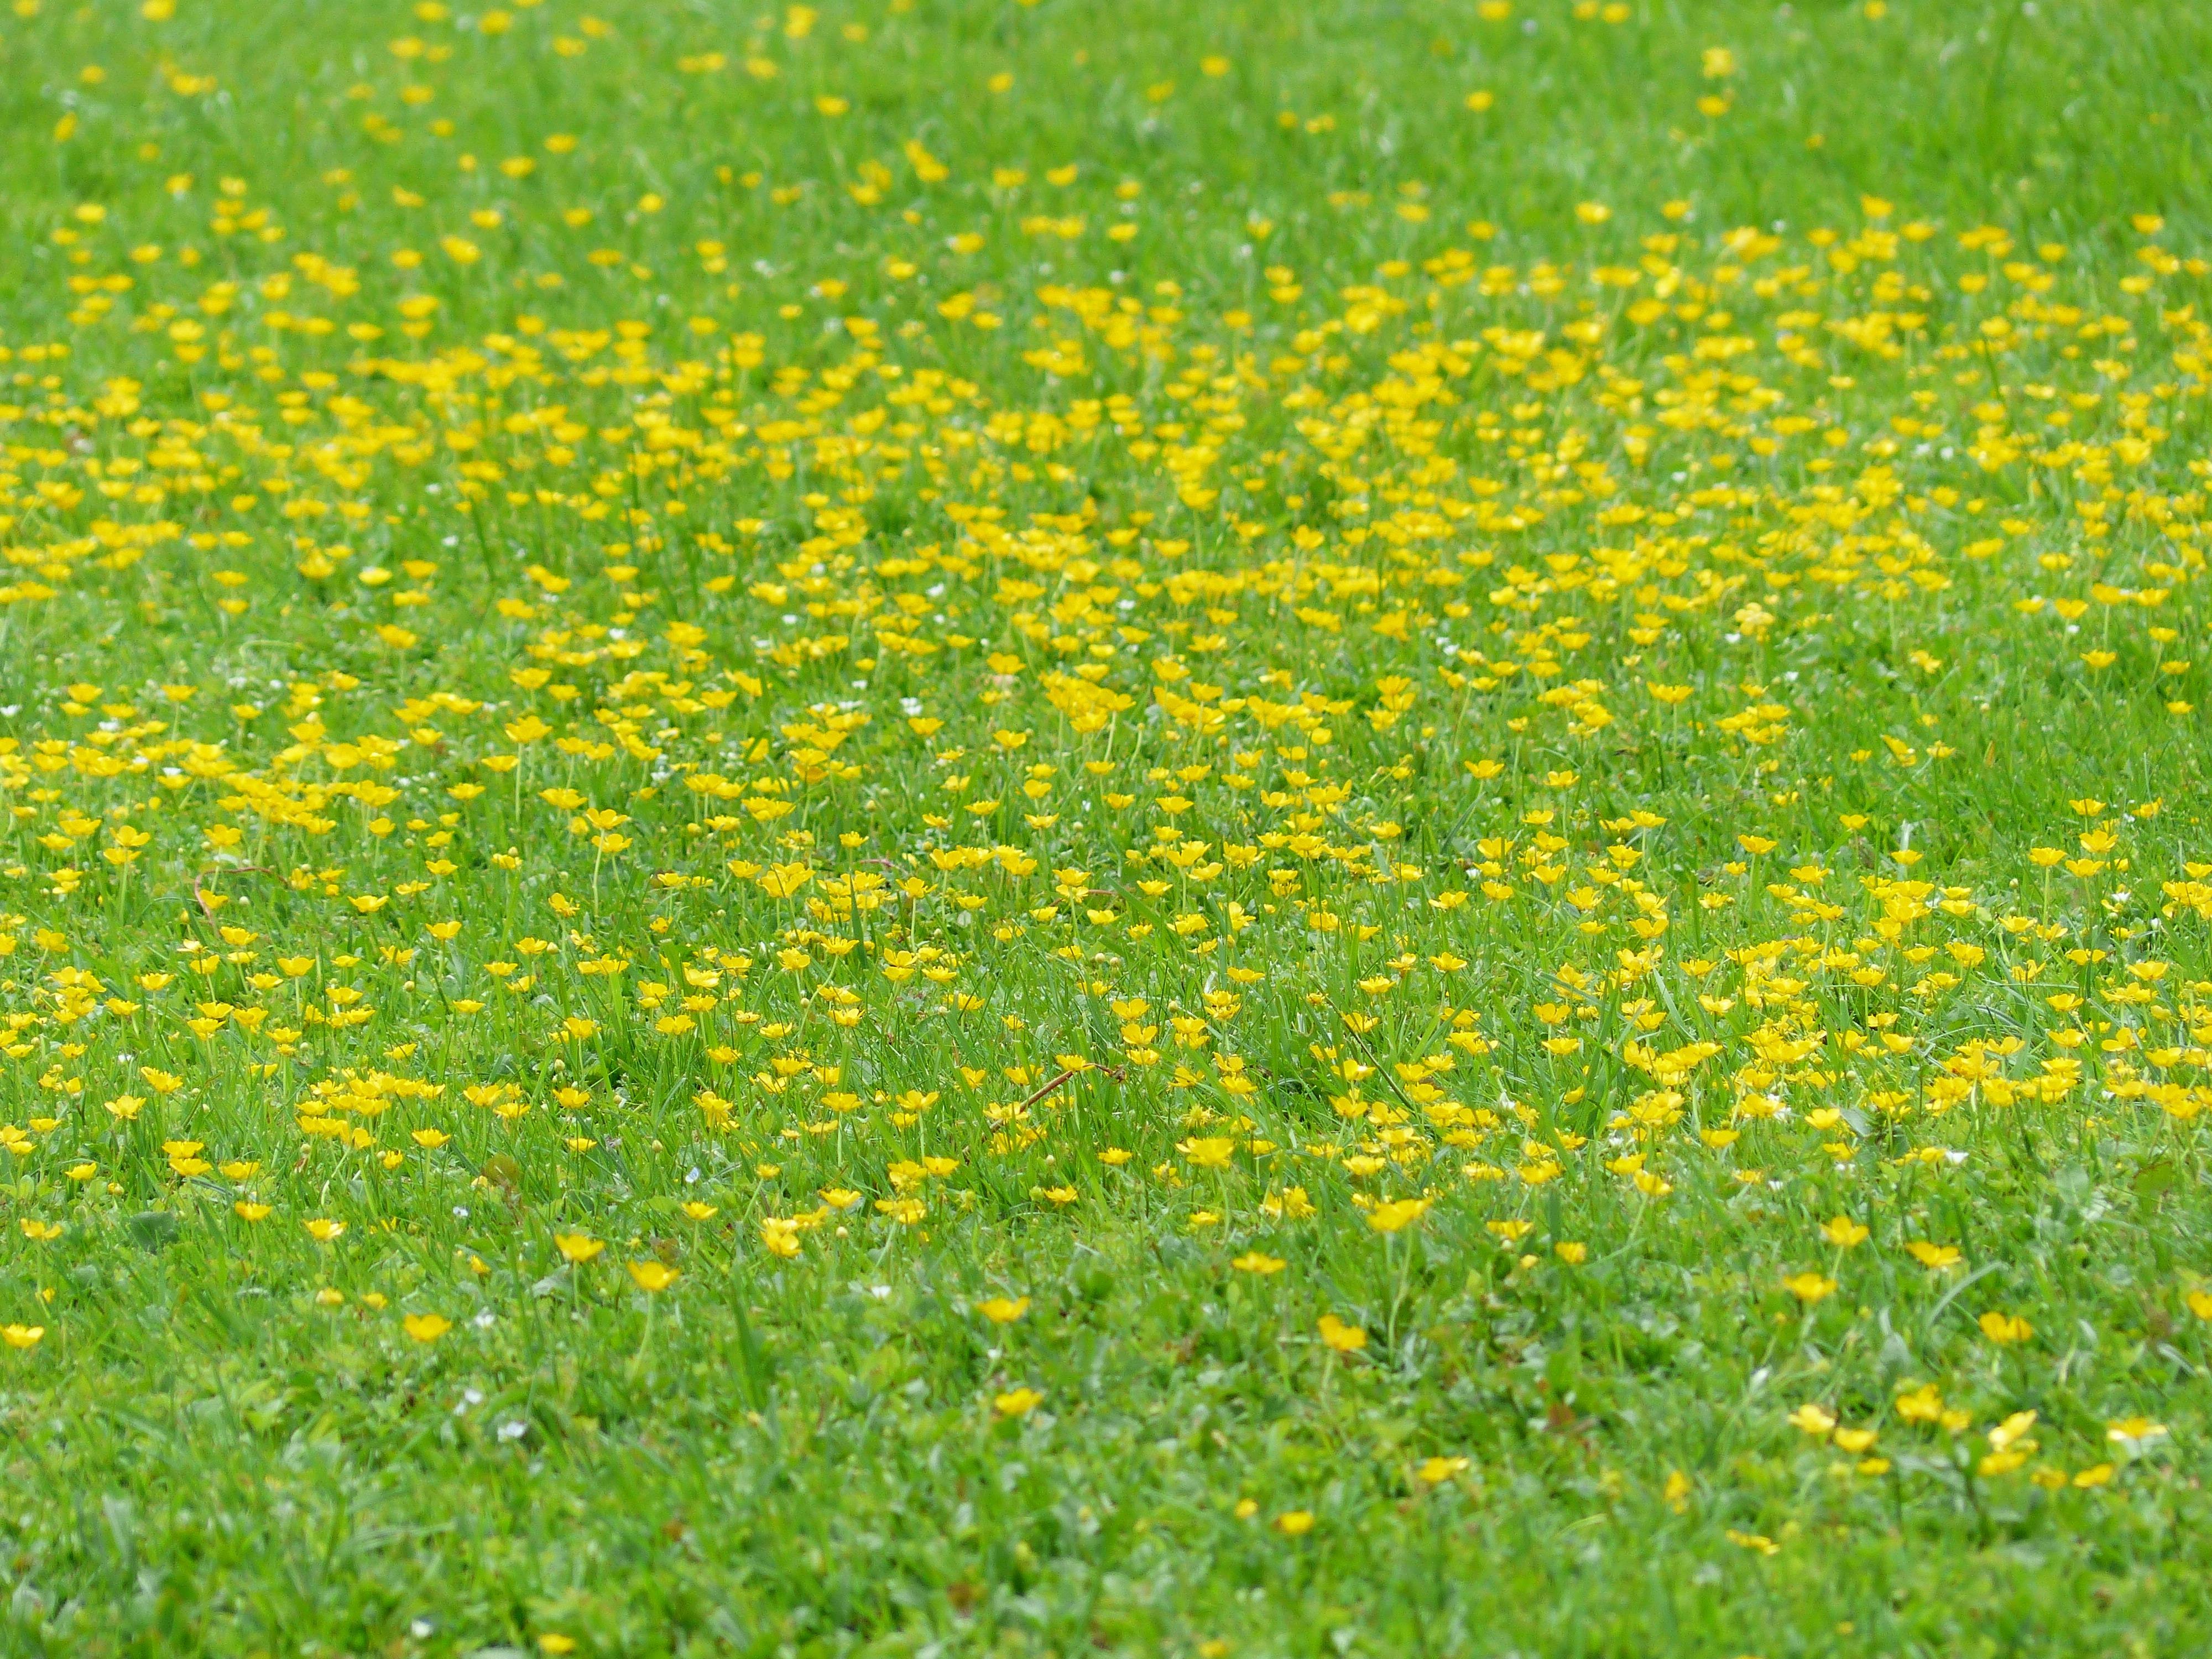 Картинки полянок без цветов